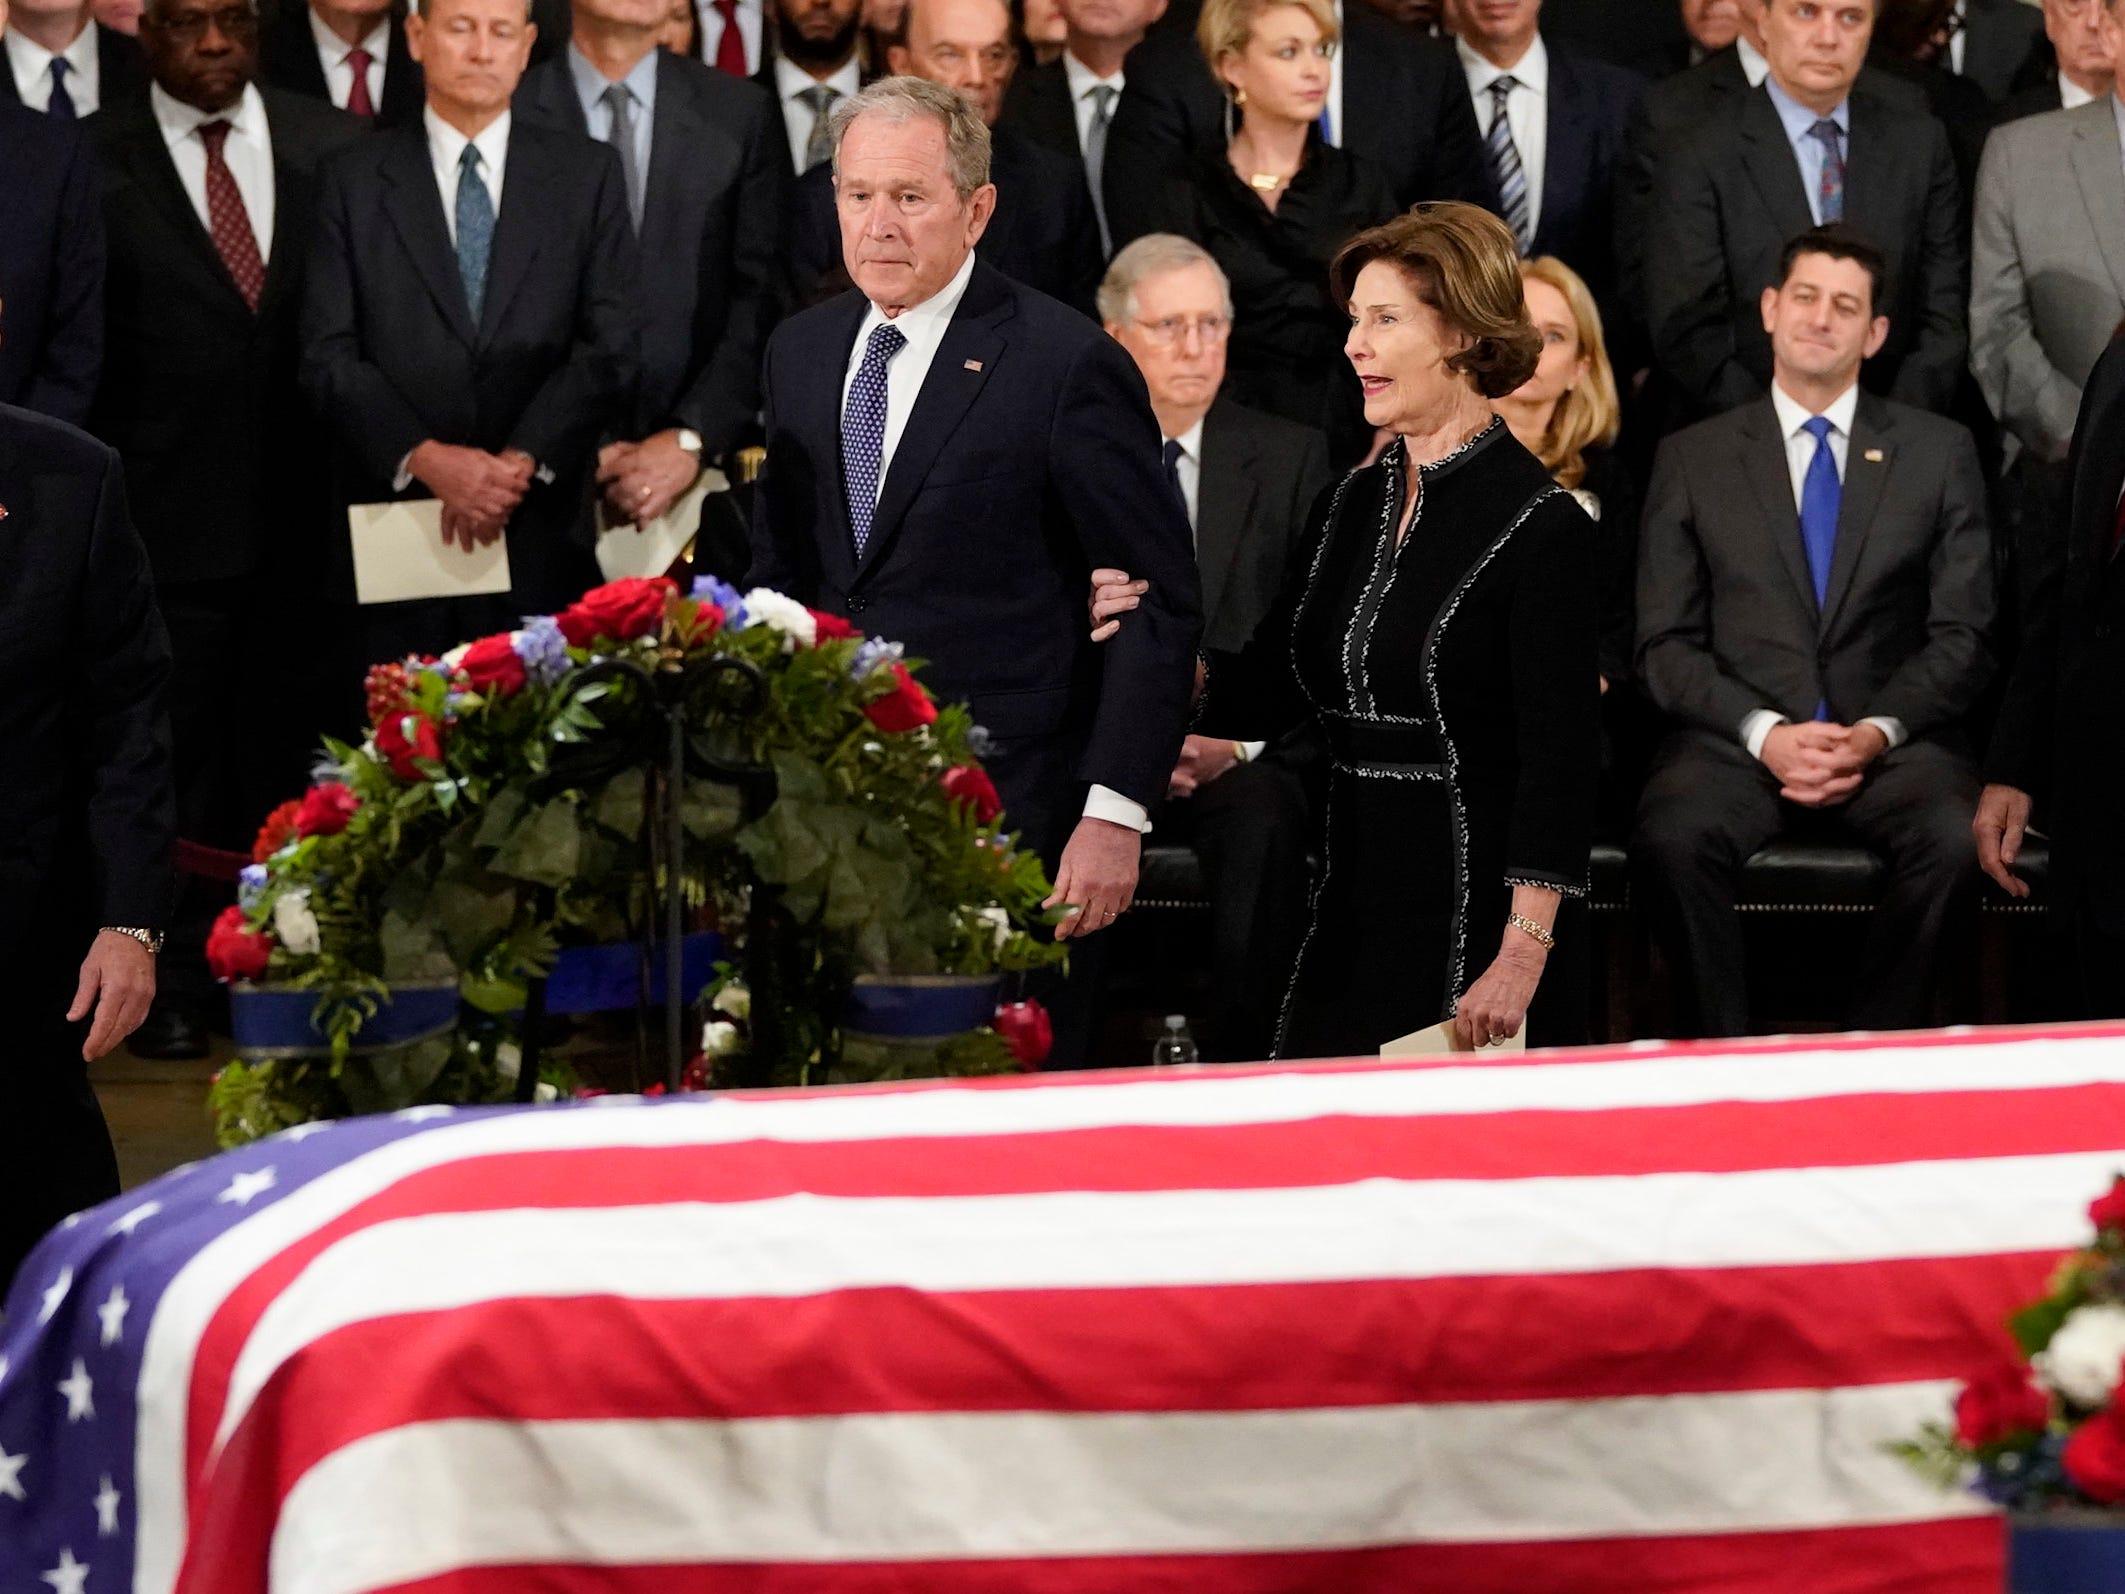 Former President George W. Bush and former first lady Laura Bush walk past the flag-draped casket of former President George H.W. Bush in the Capitol Rotunda, Monday, Dec. 3, 2018 in Washington.